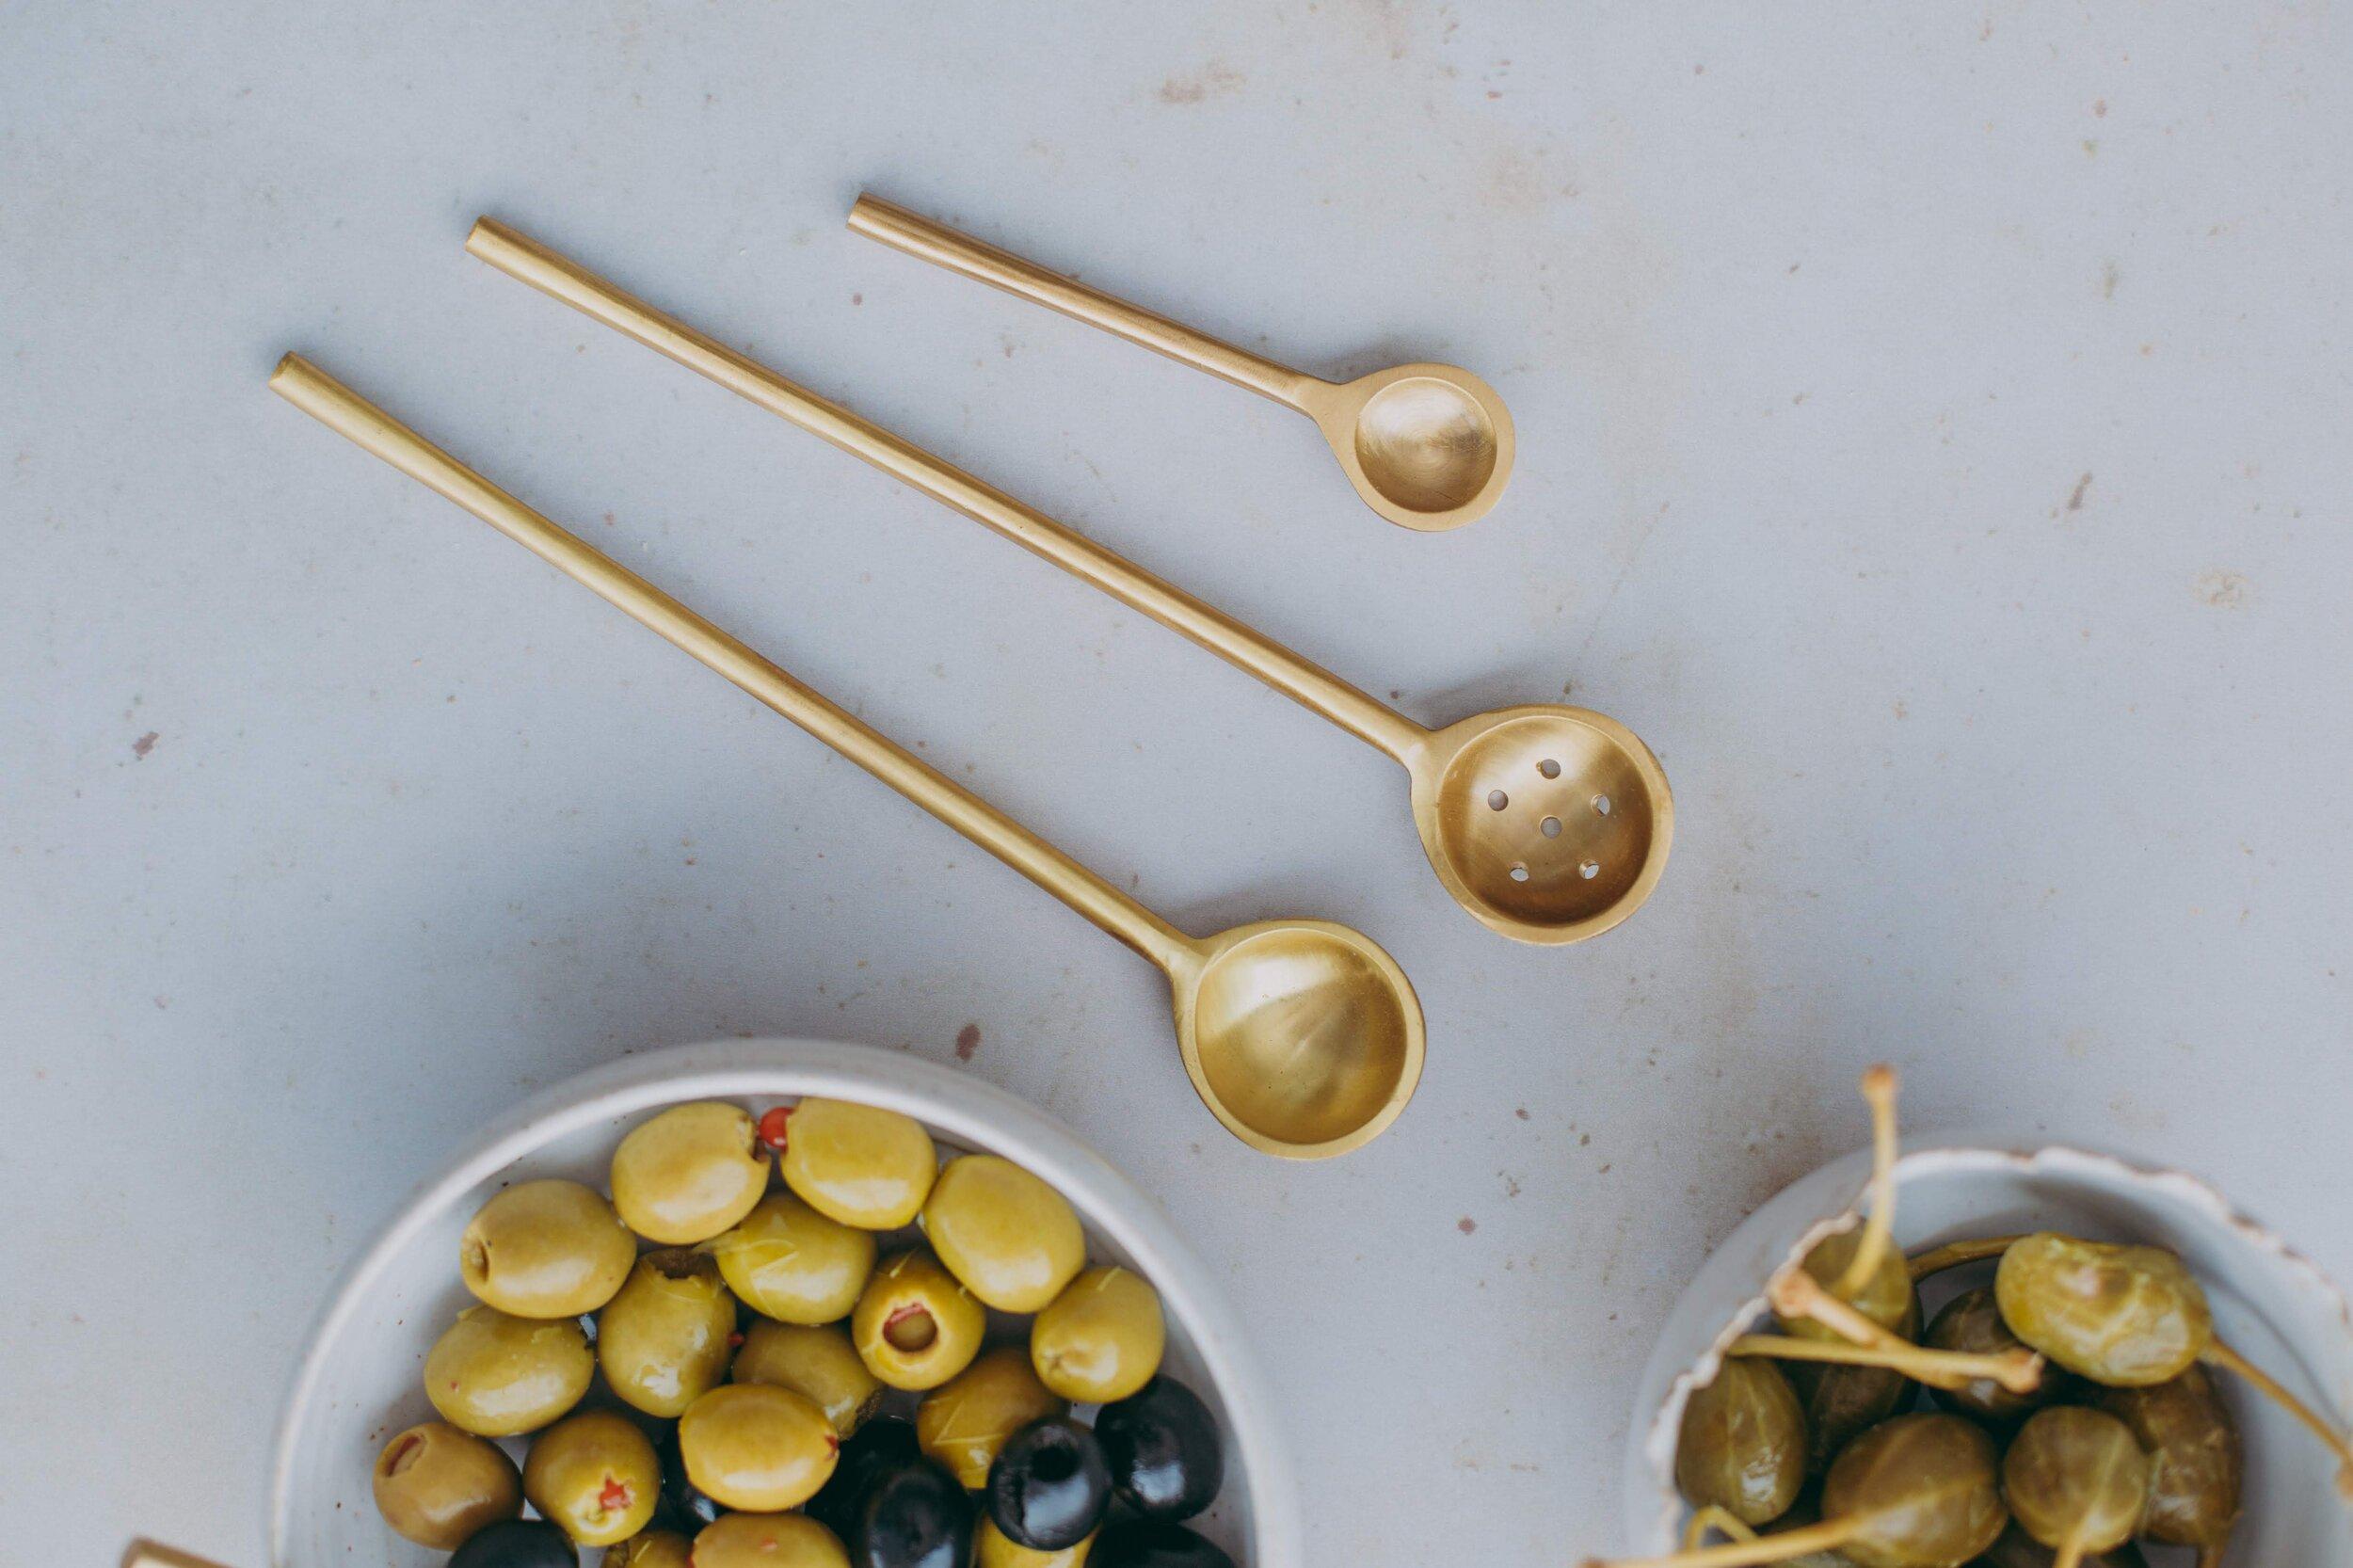 H&R ceramics handmade and brass serving spoons 2.jpg